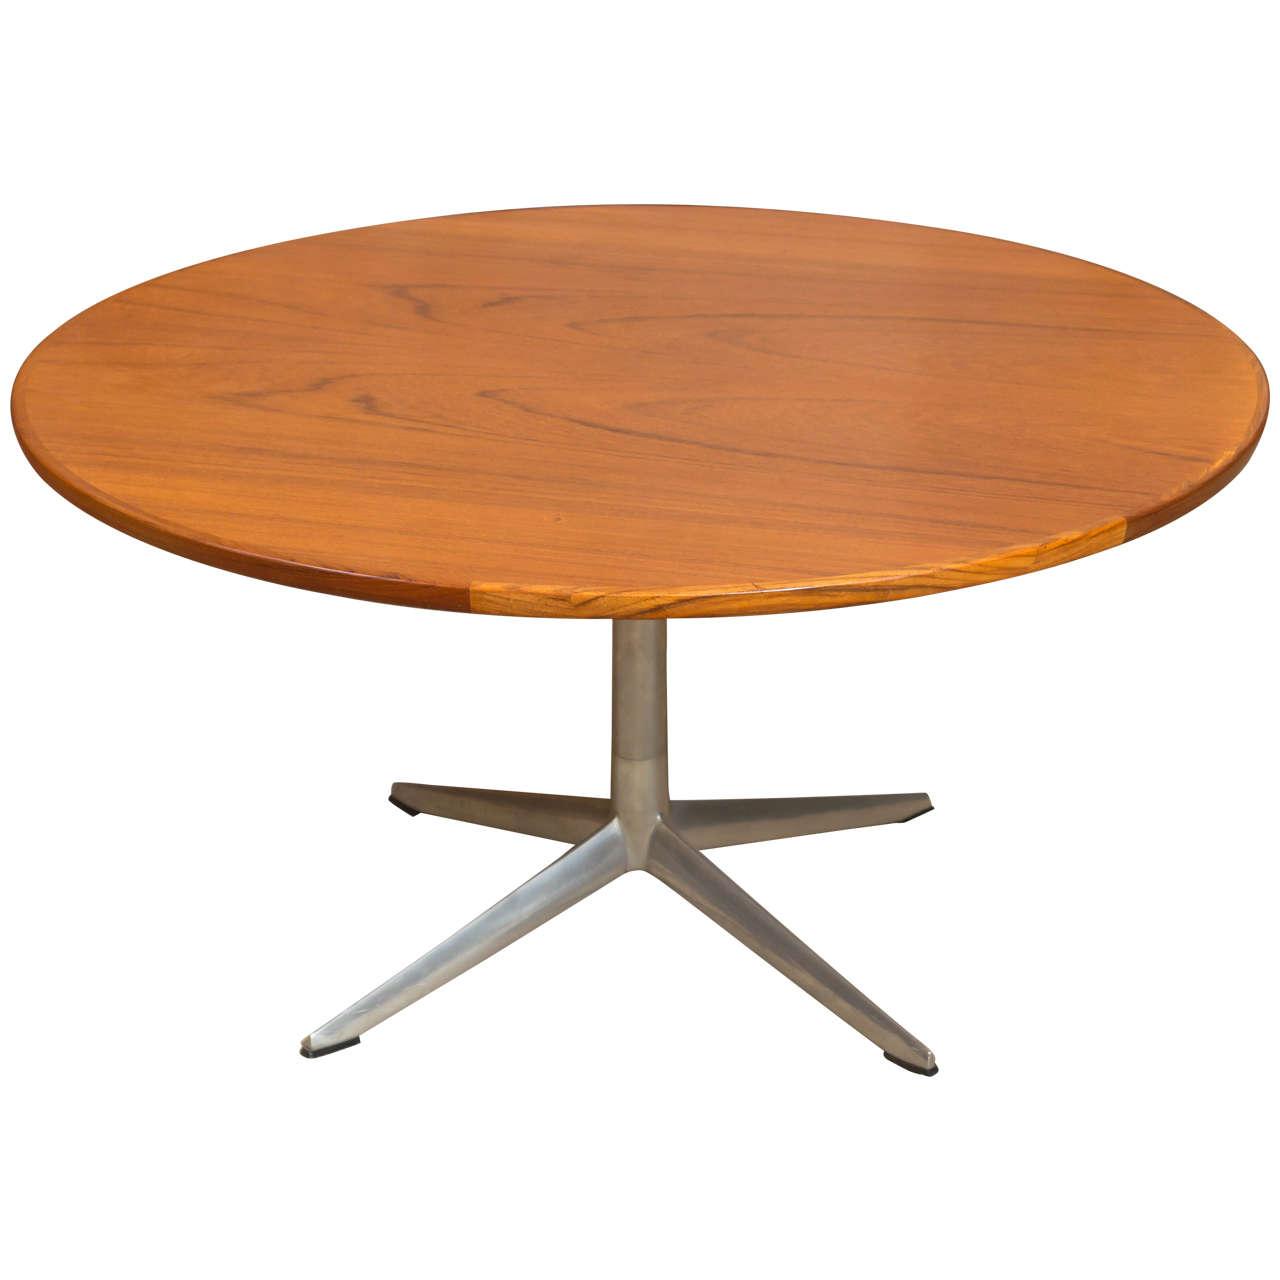 Hw klein for bramin round teak coffee table for sale at 1stdibs hw klein for bramin round teak coffee table 1 geotapseo Choice Image